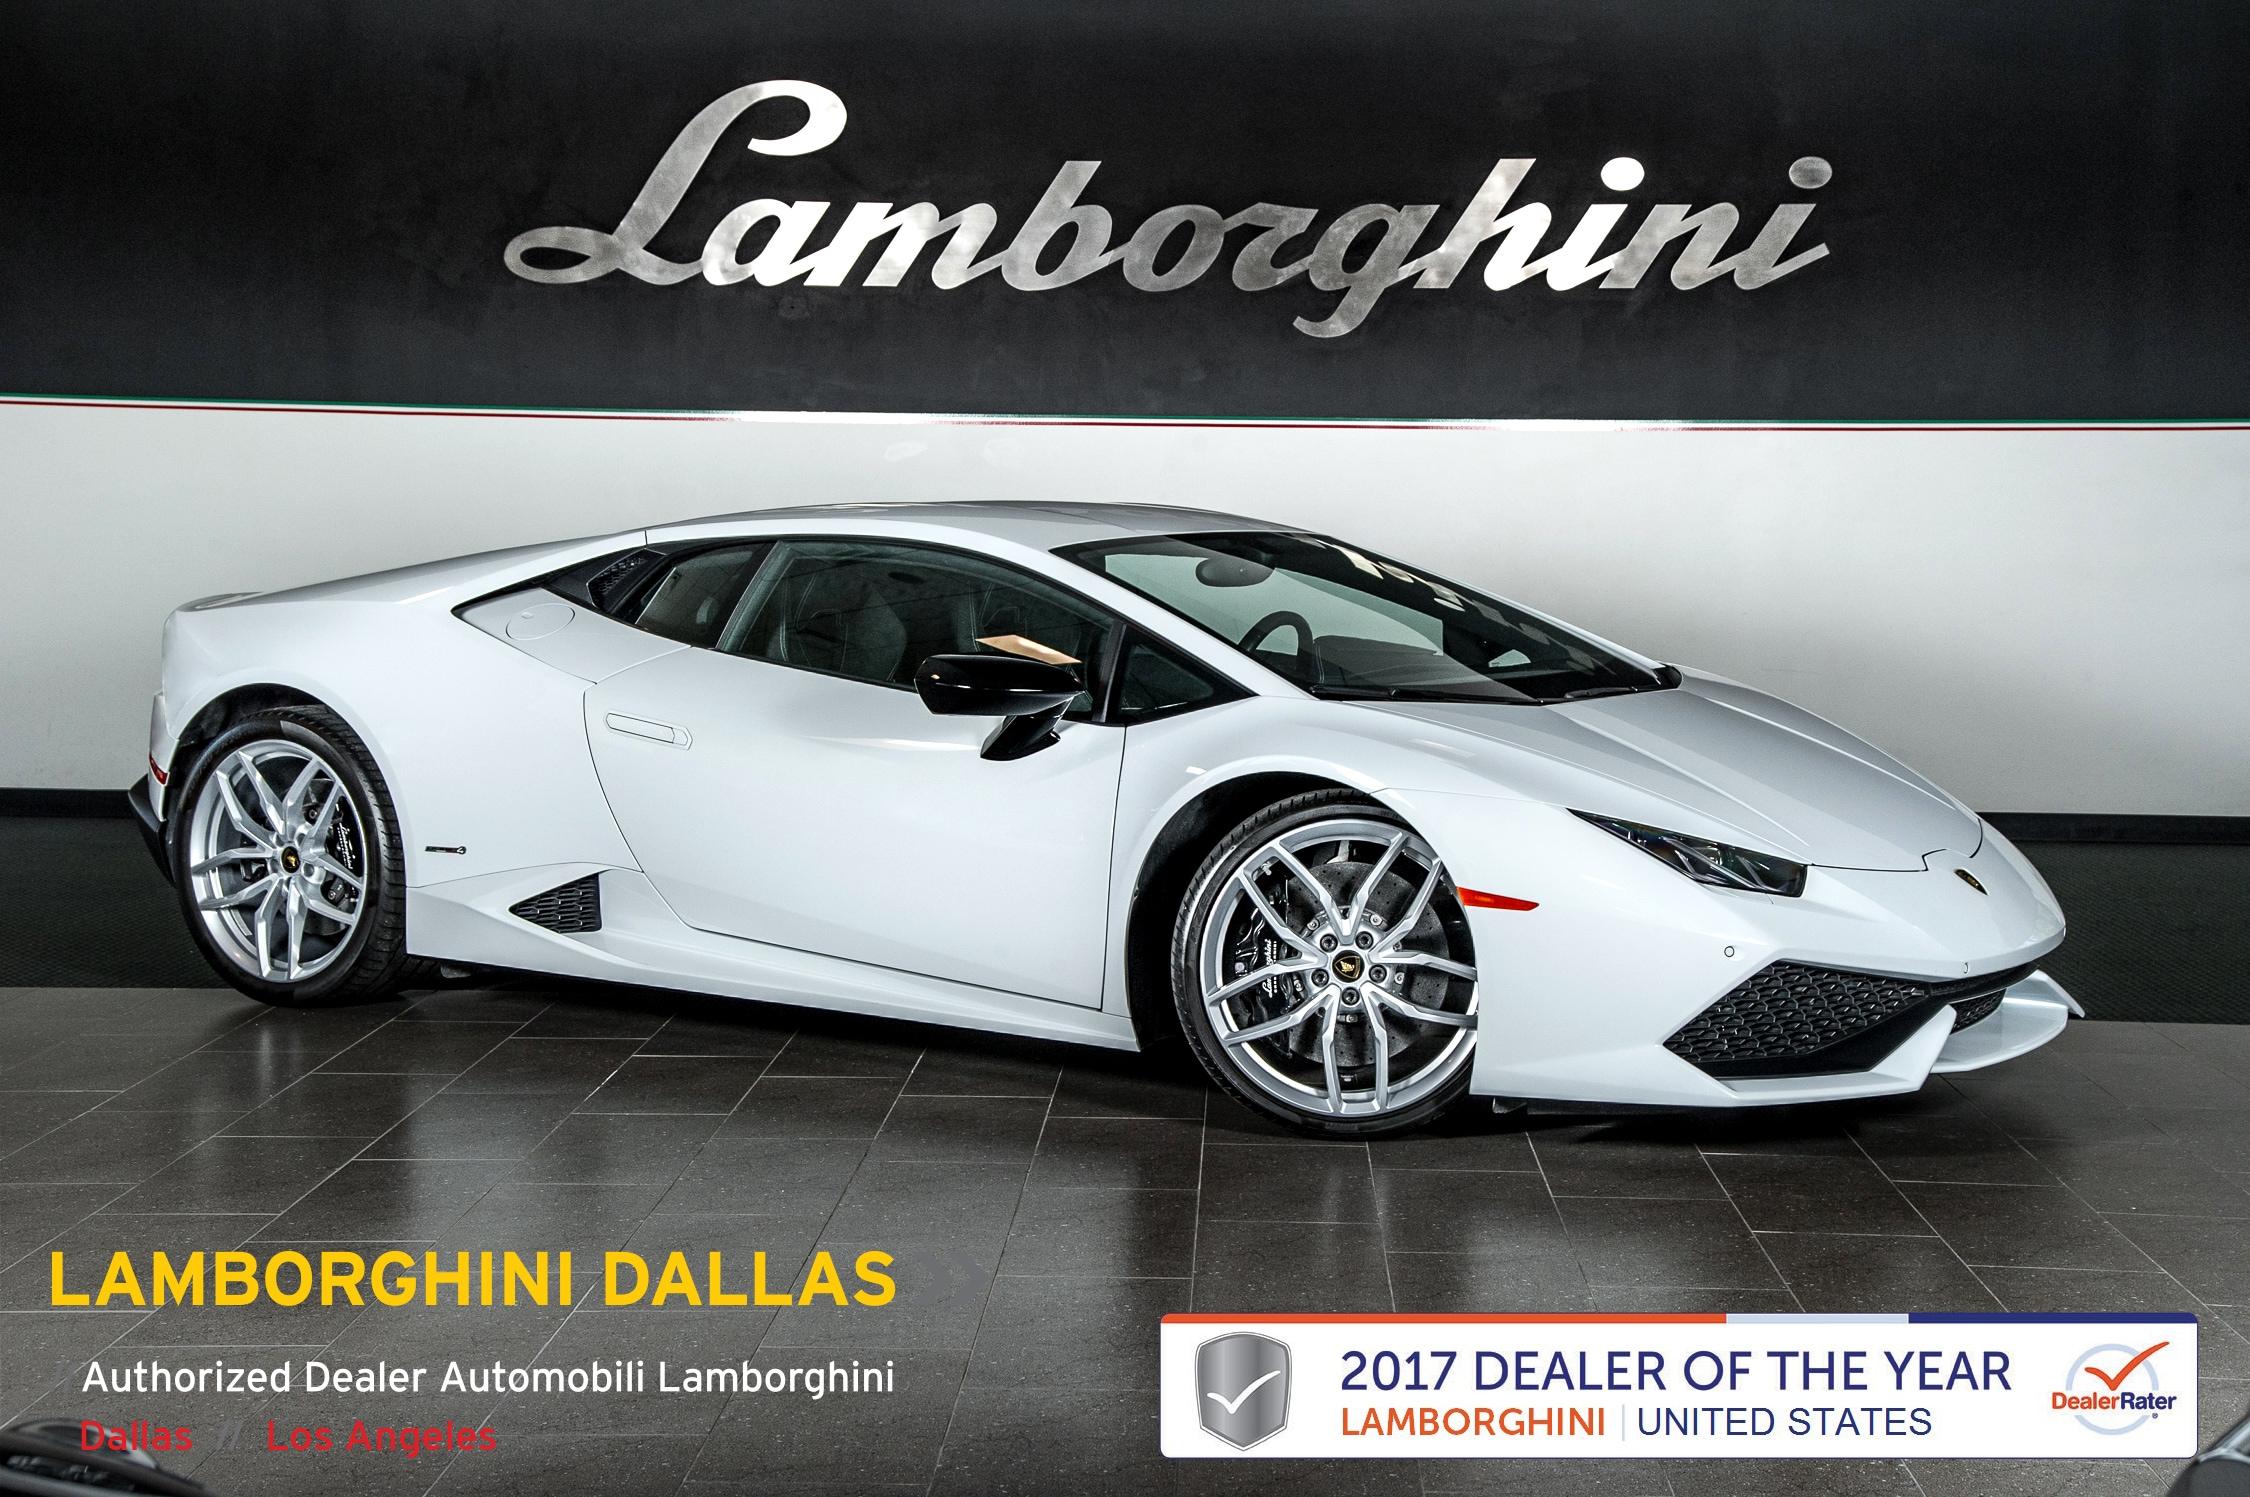 f44bc4071e8cf445f050aca5c36785ebx Amazing 2015 Lamborghini Huracan Price Per Month Cars Trend